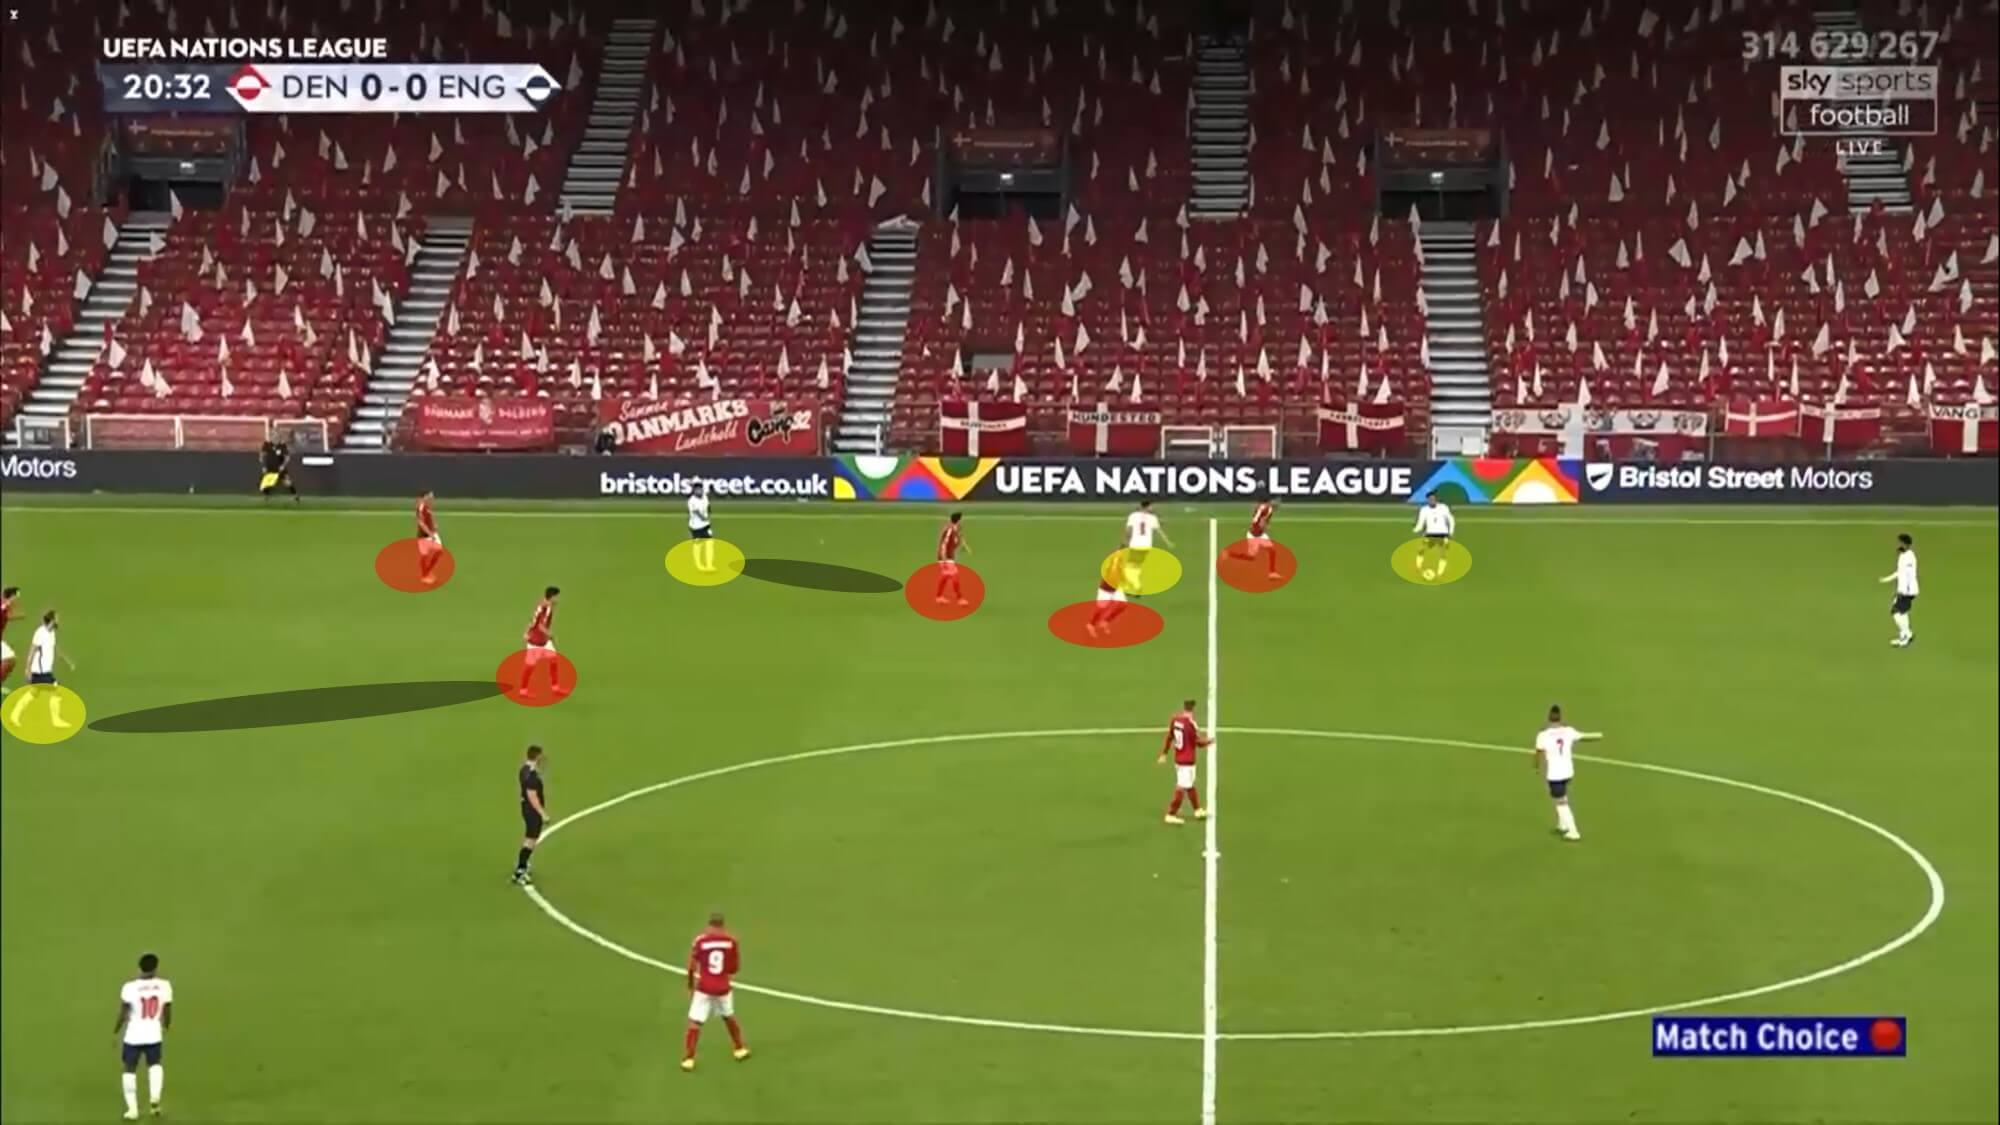 Uefa Nations League 2020 21 Denmark Vs England